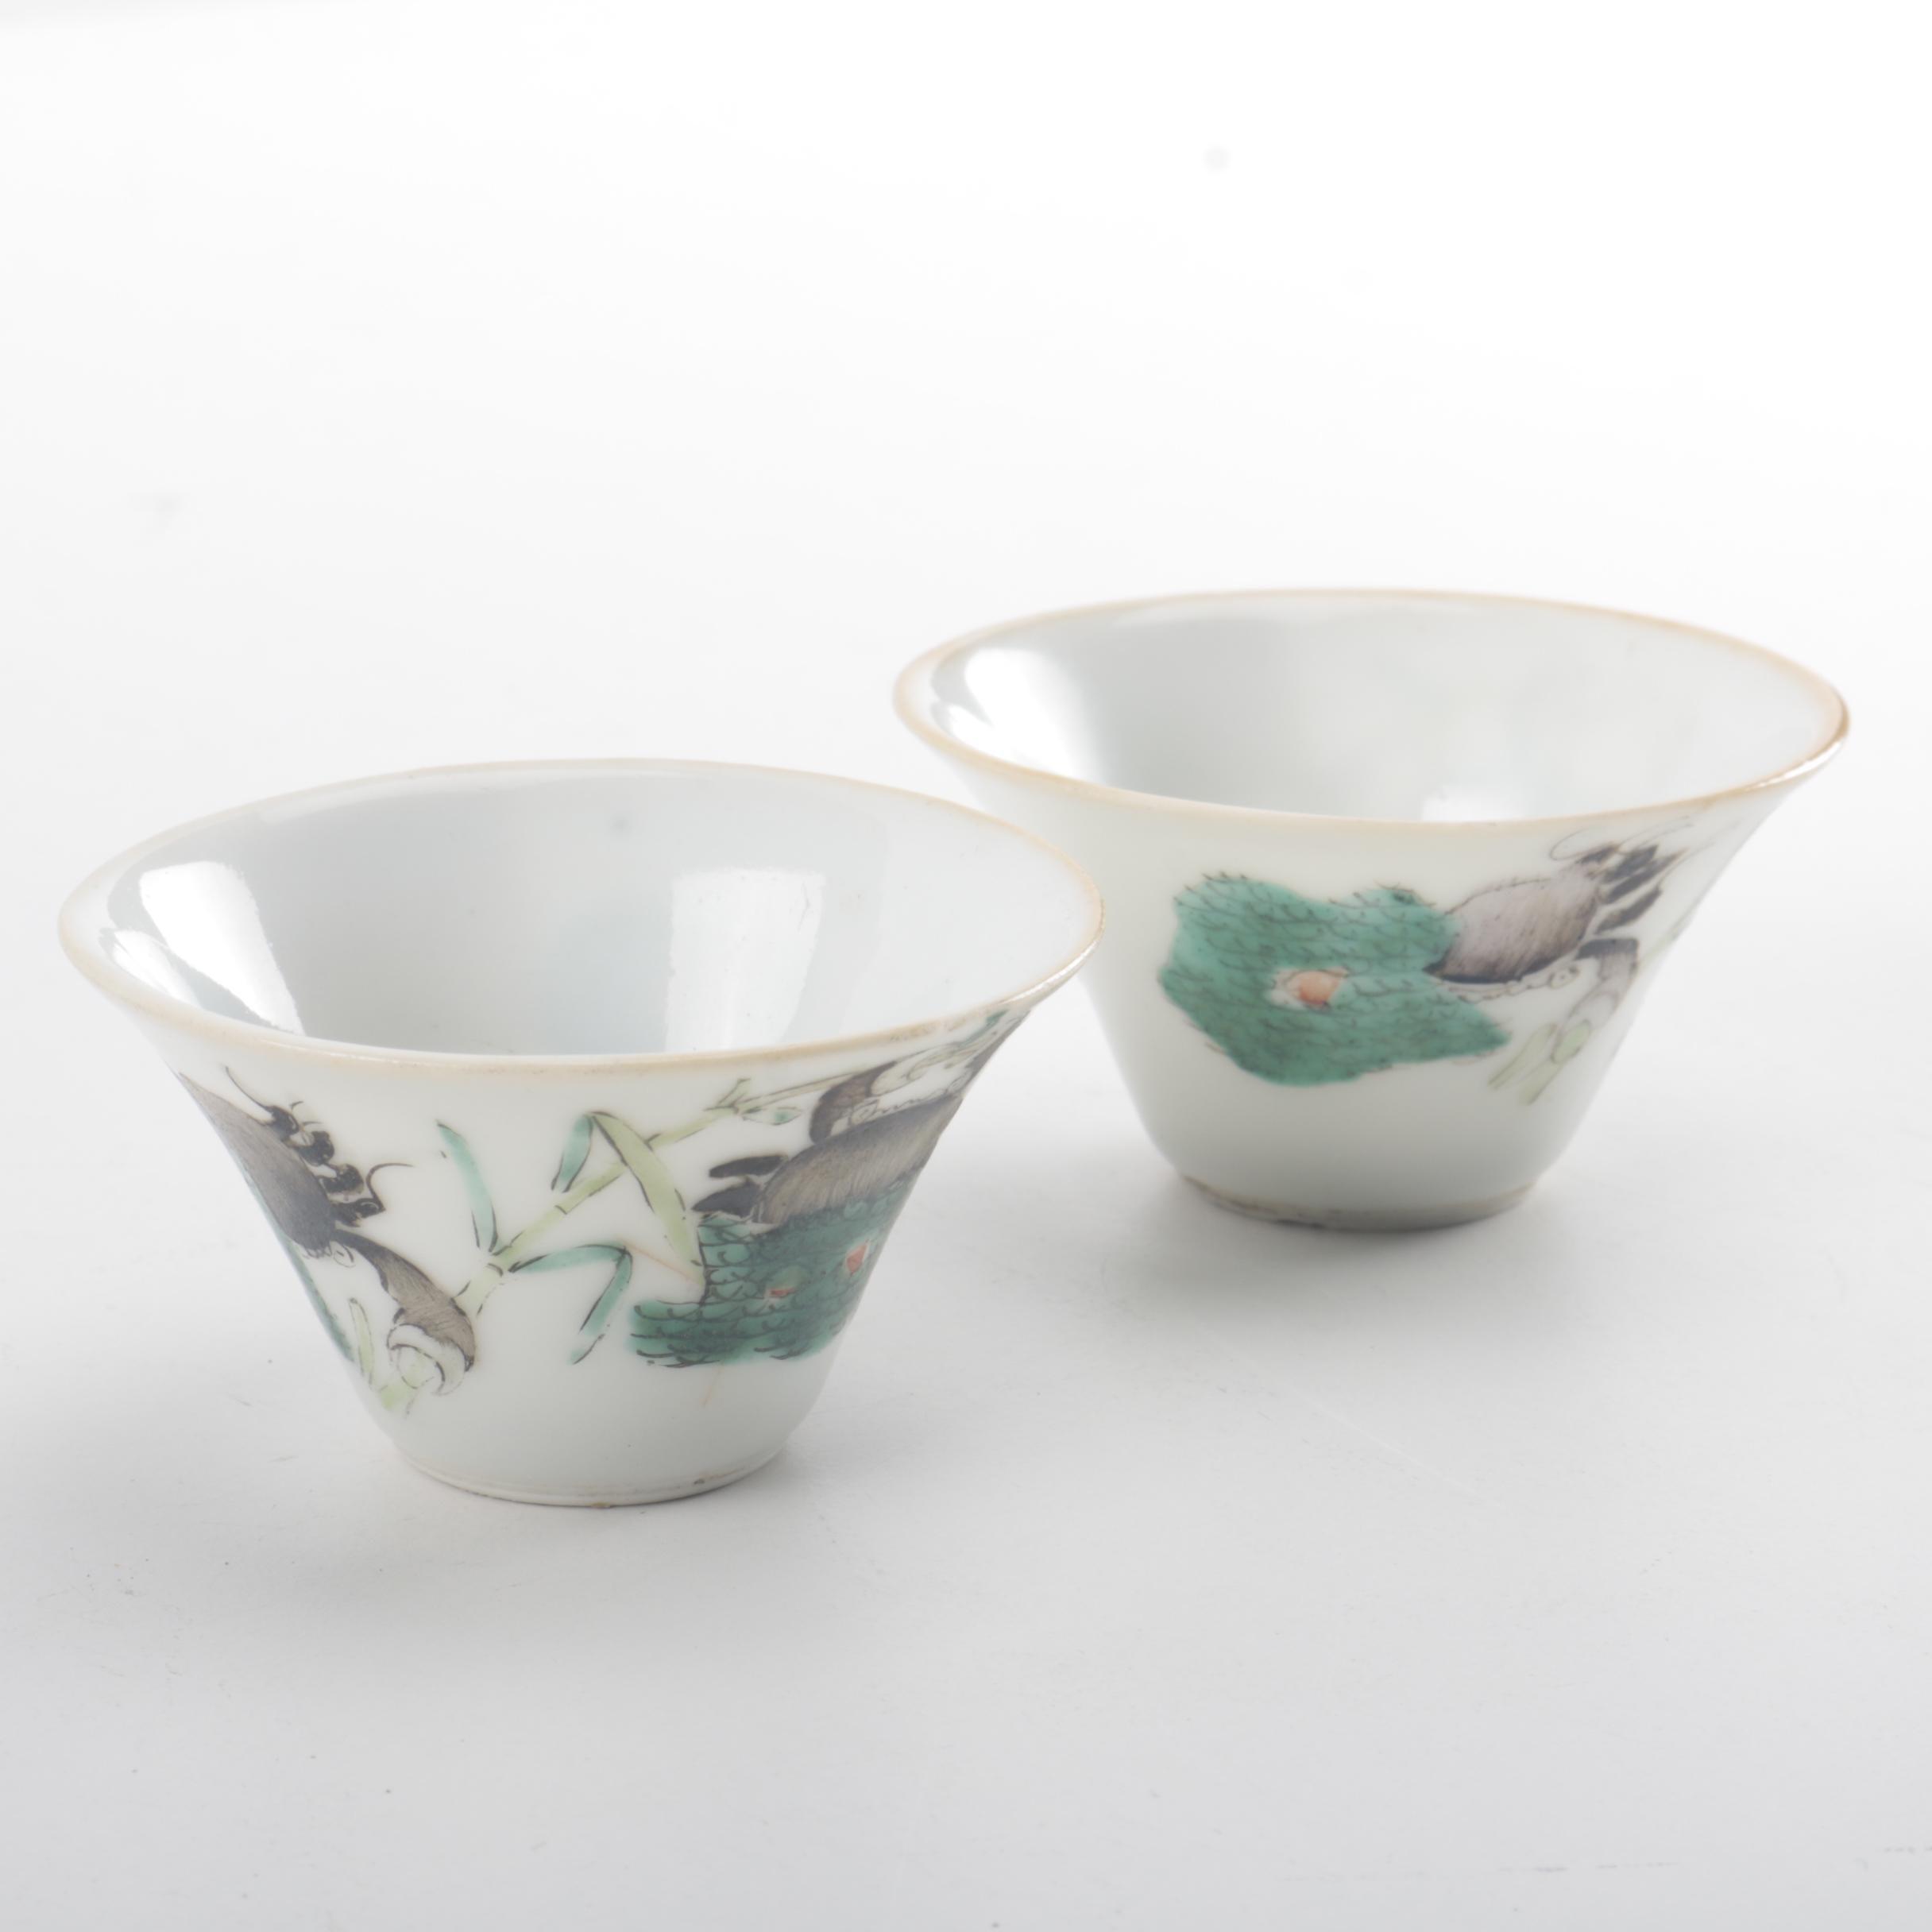 Antique Chinese Porcelain Bowls